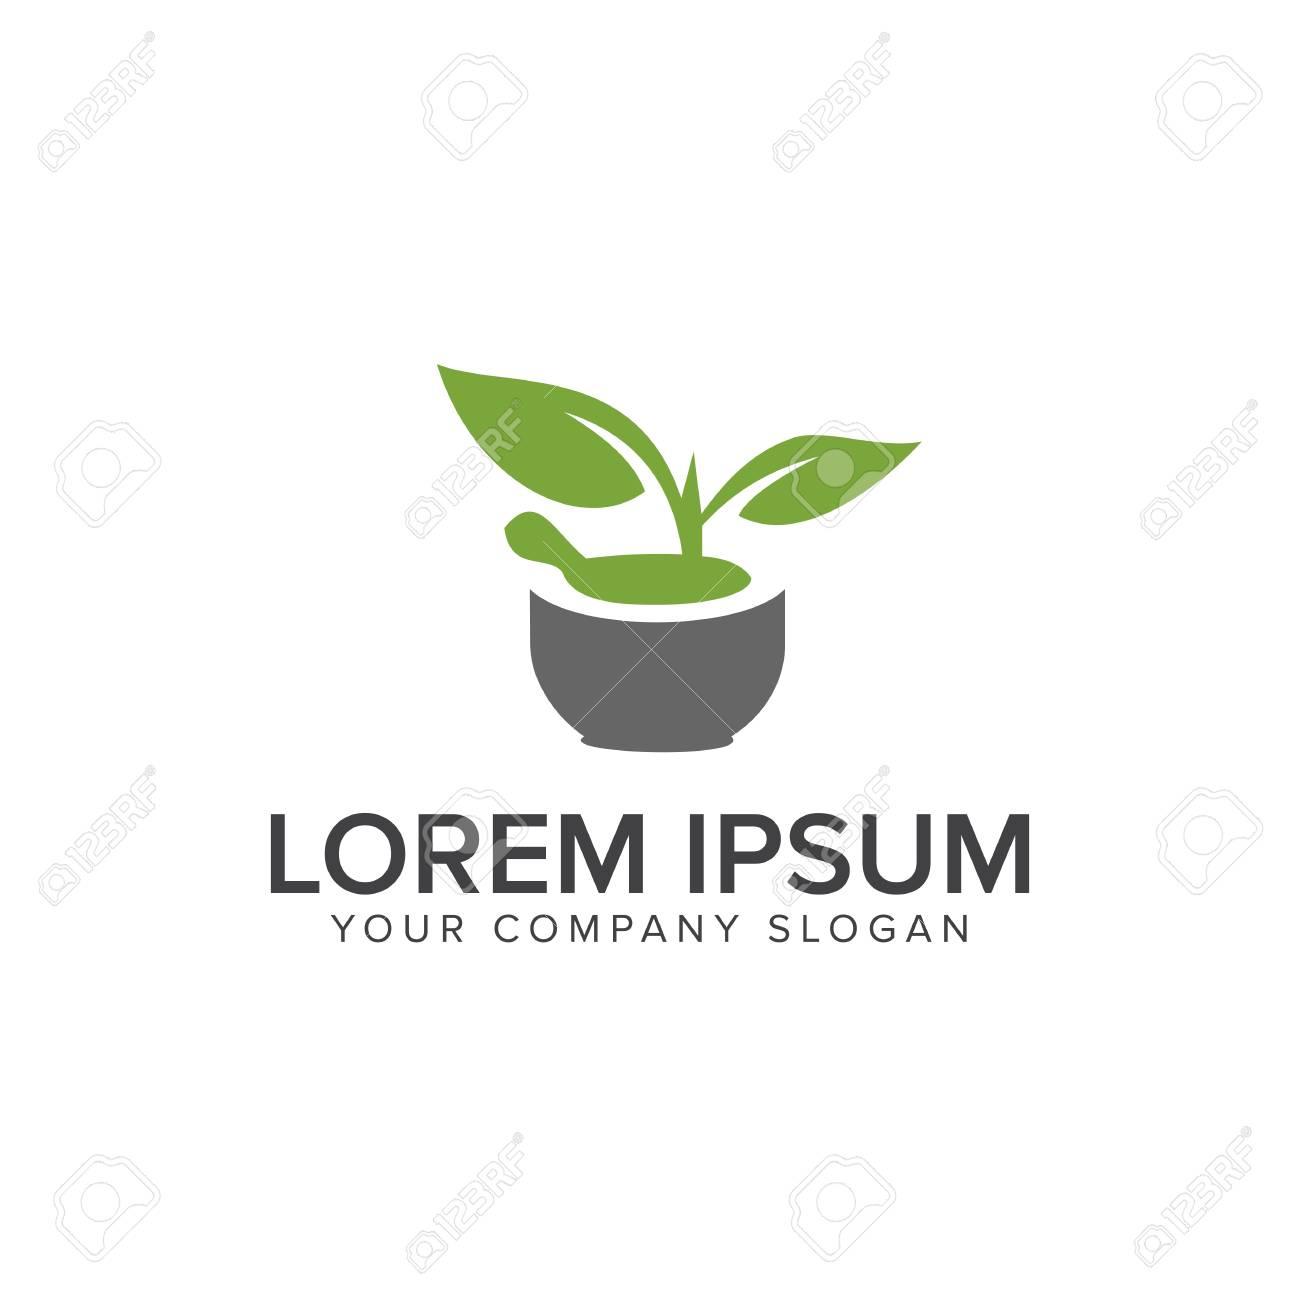 nature green medical logo pharmacy design concept template royalty